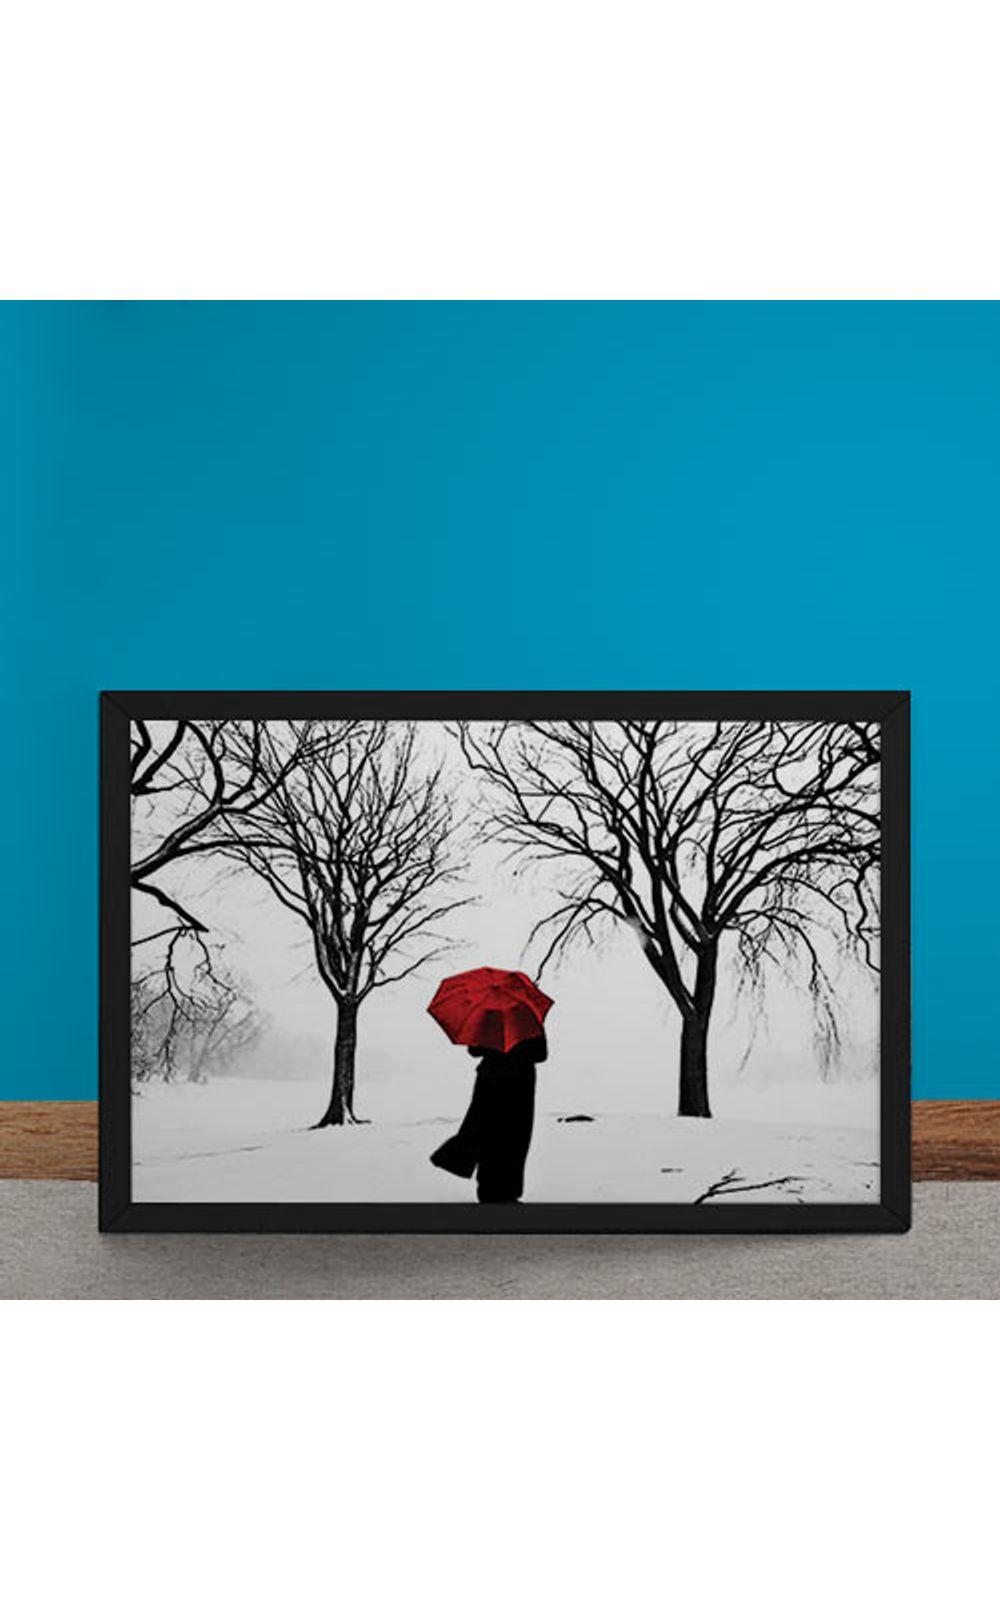 Foto 6 - Quadro Decorativo Guarda Chuva Vermelho na Neve